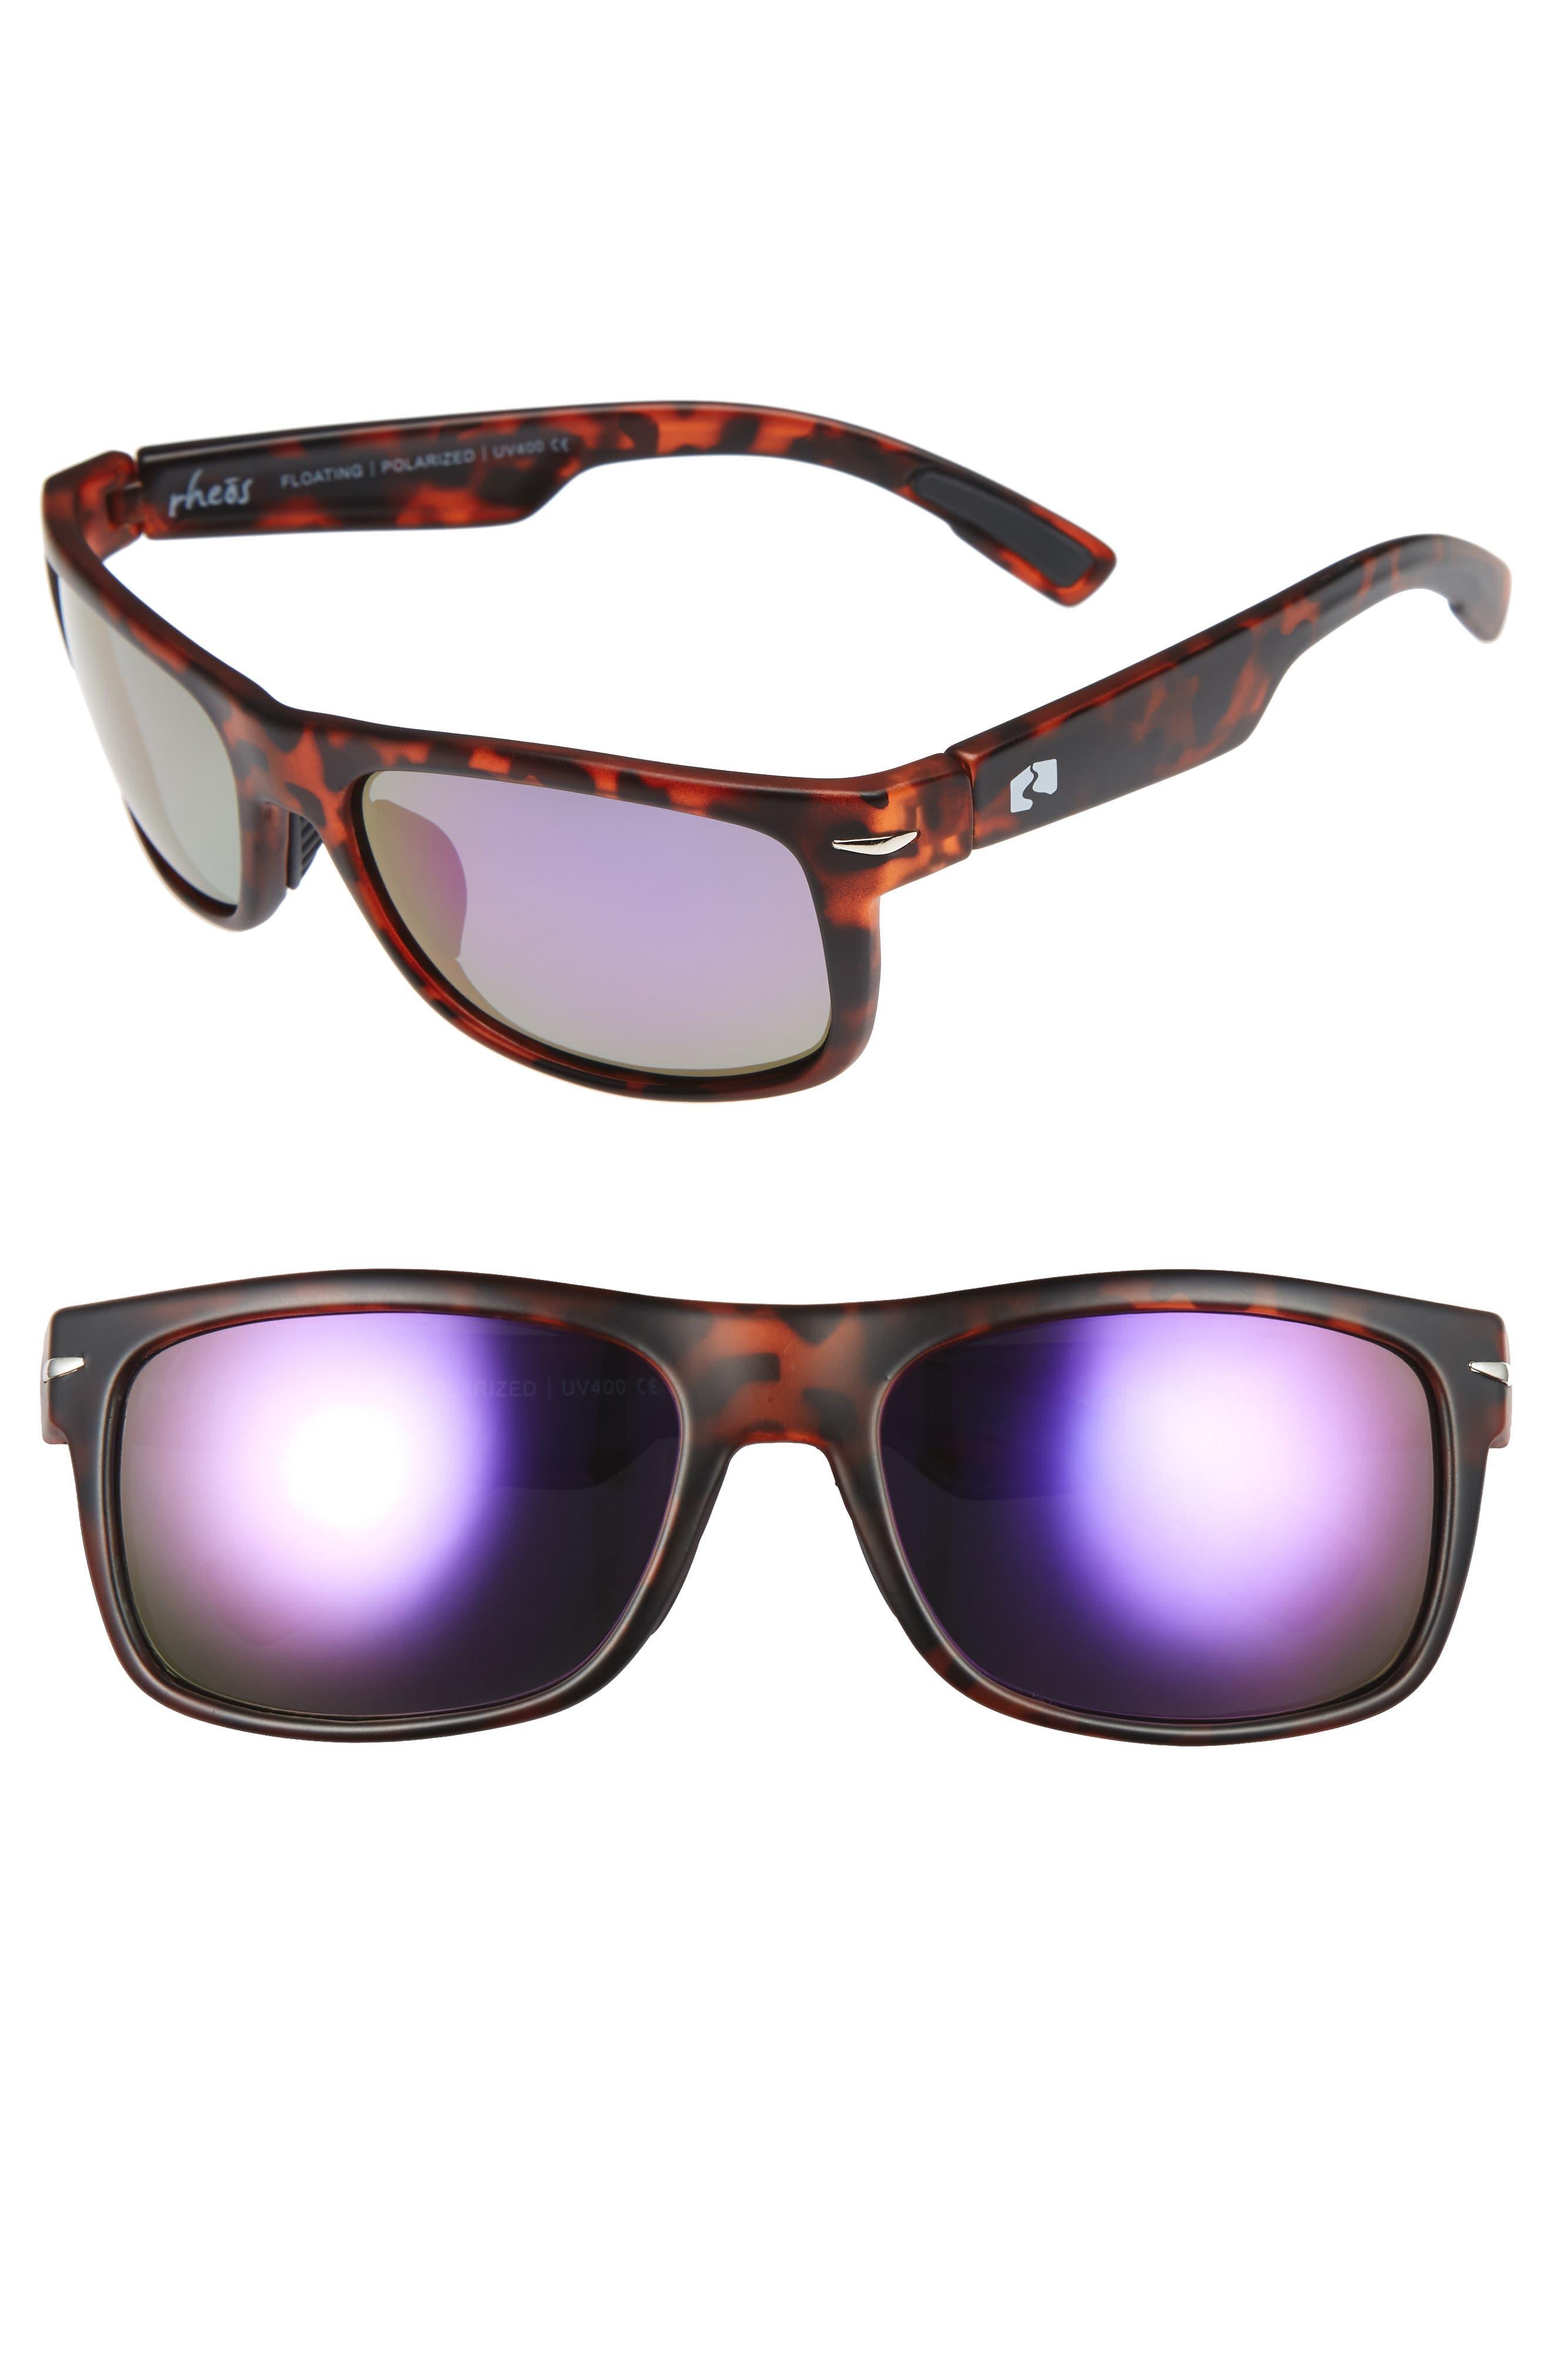 Anhingas Floating 59mm Polarized Sunglasses,                             Main thumbnail 1, color,                             TORTOISE/ PURPLE